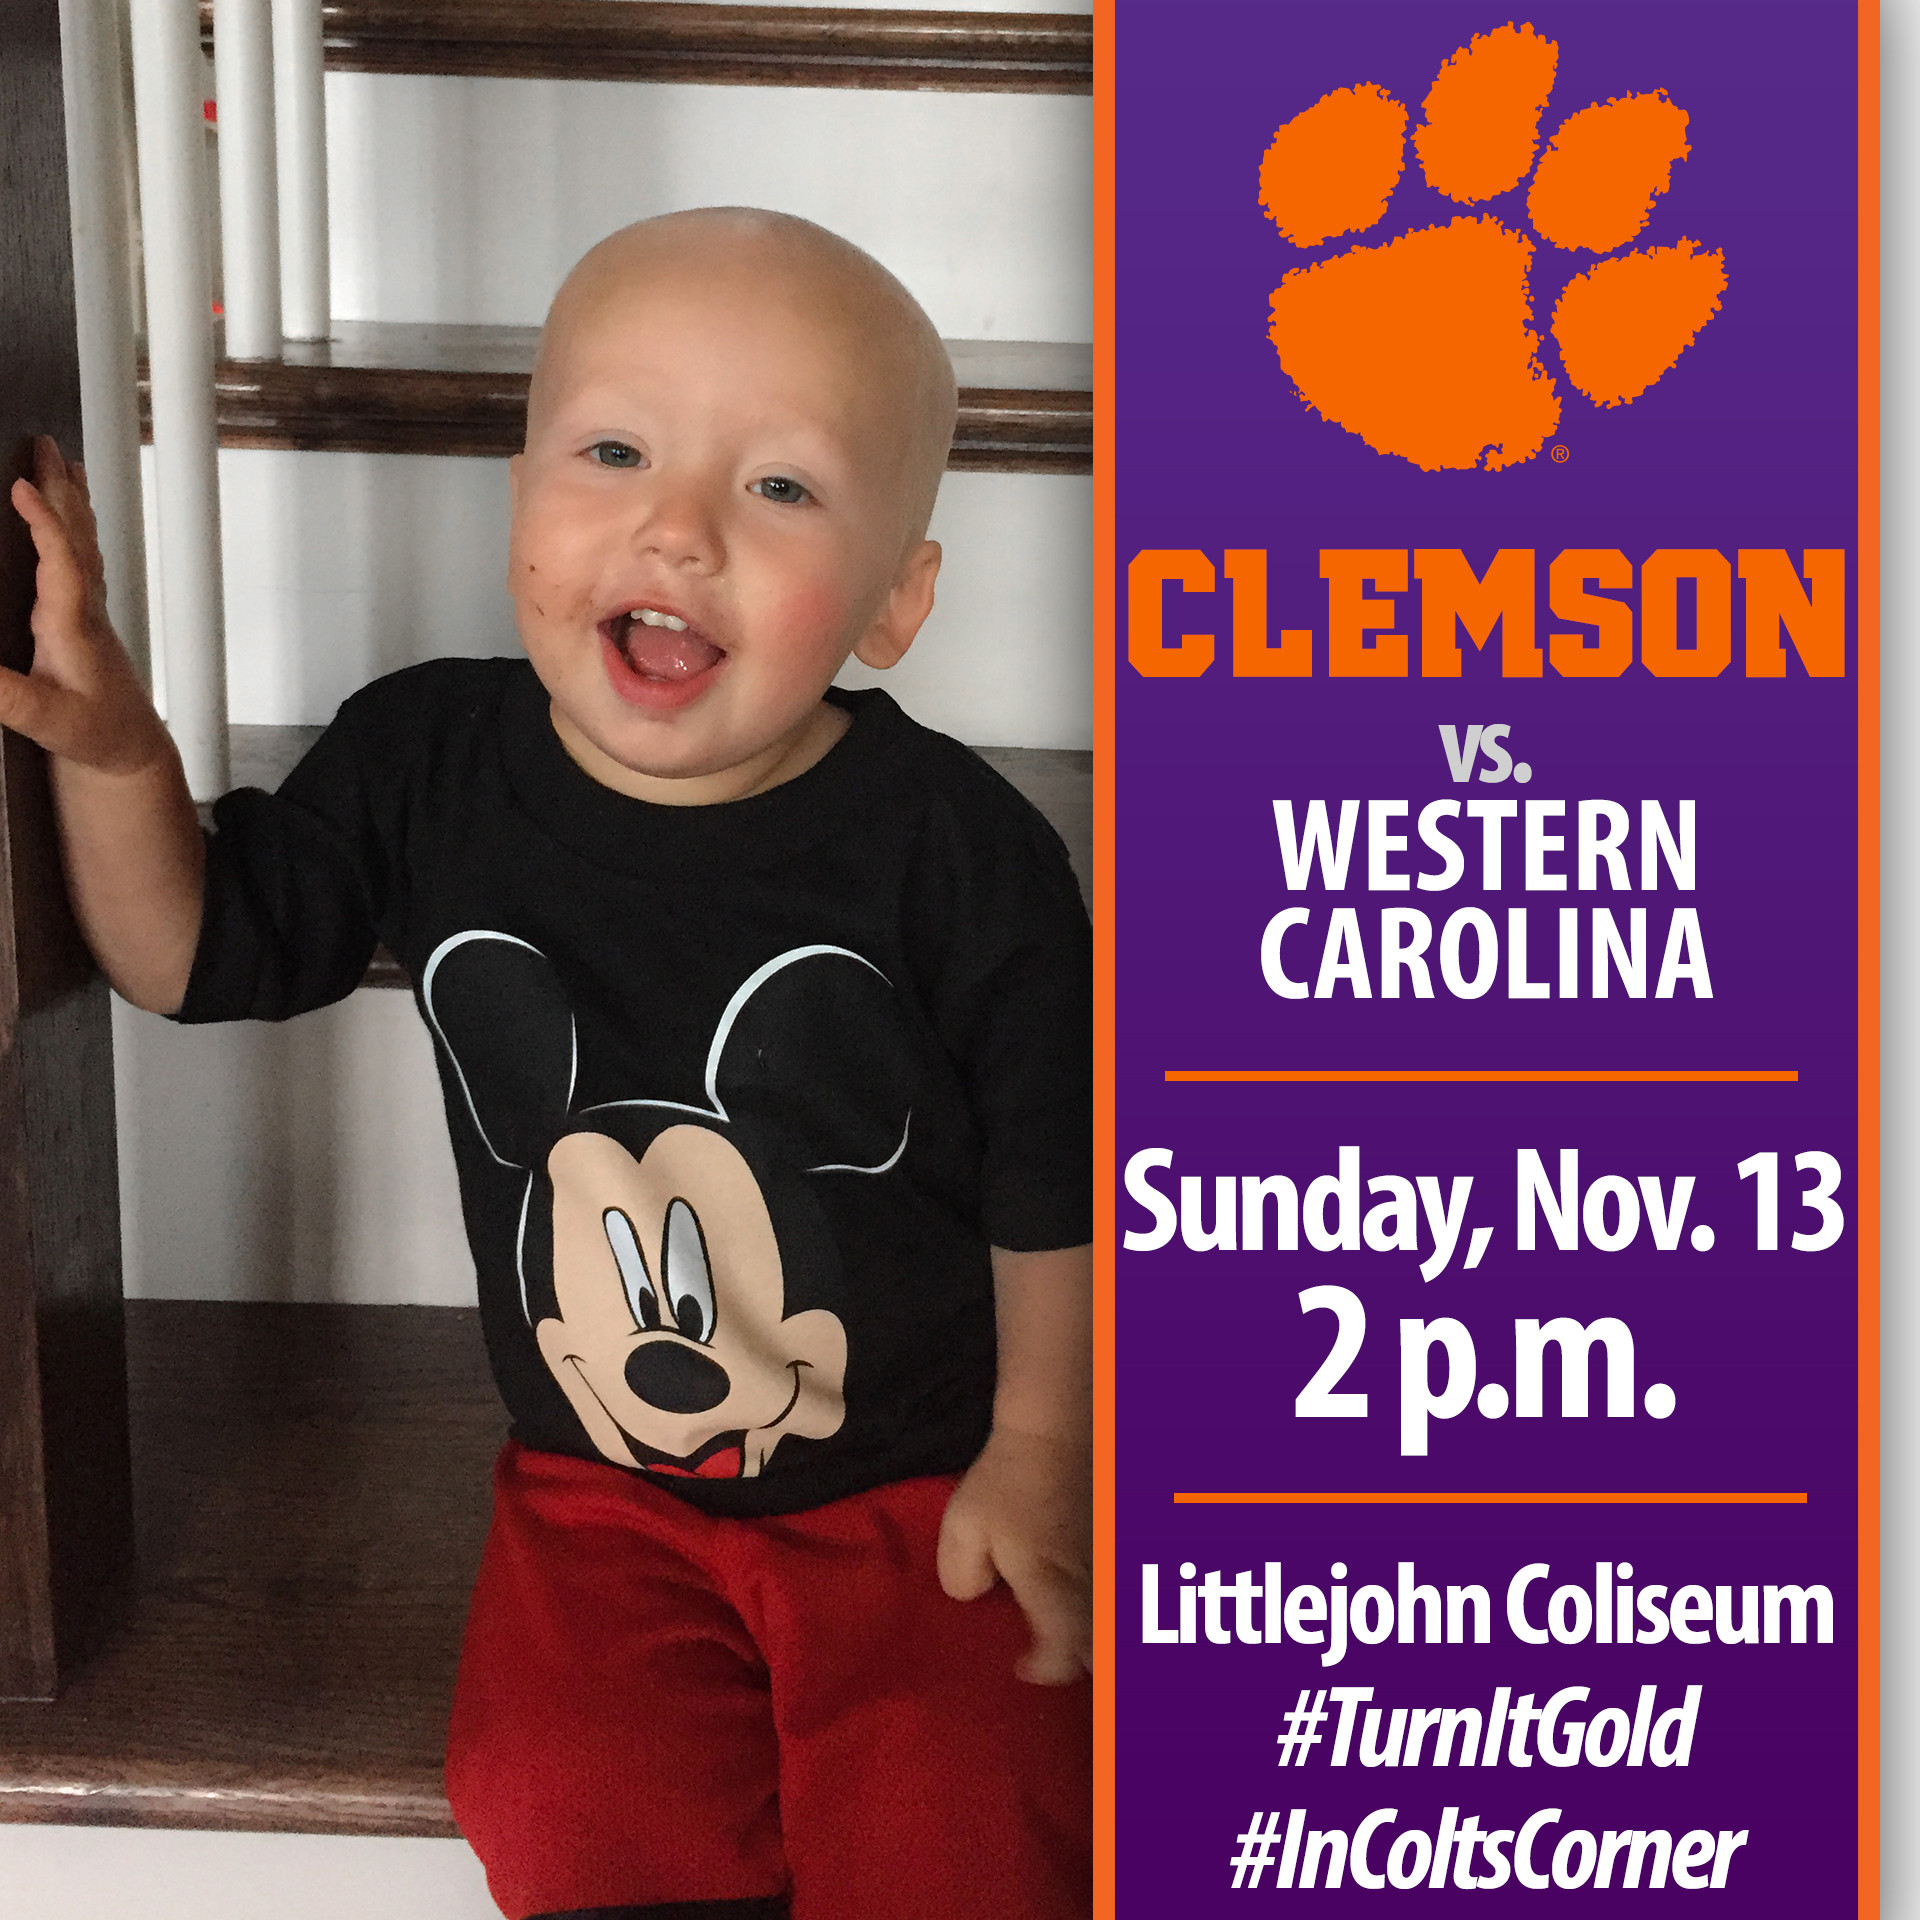 Tigers Host Pediatric Cancer Awareness Game vs. Western Carolina Sunday